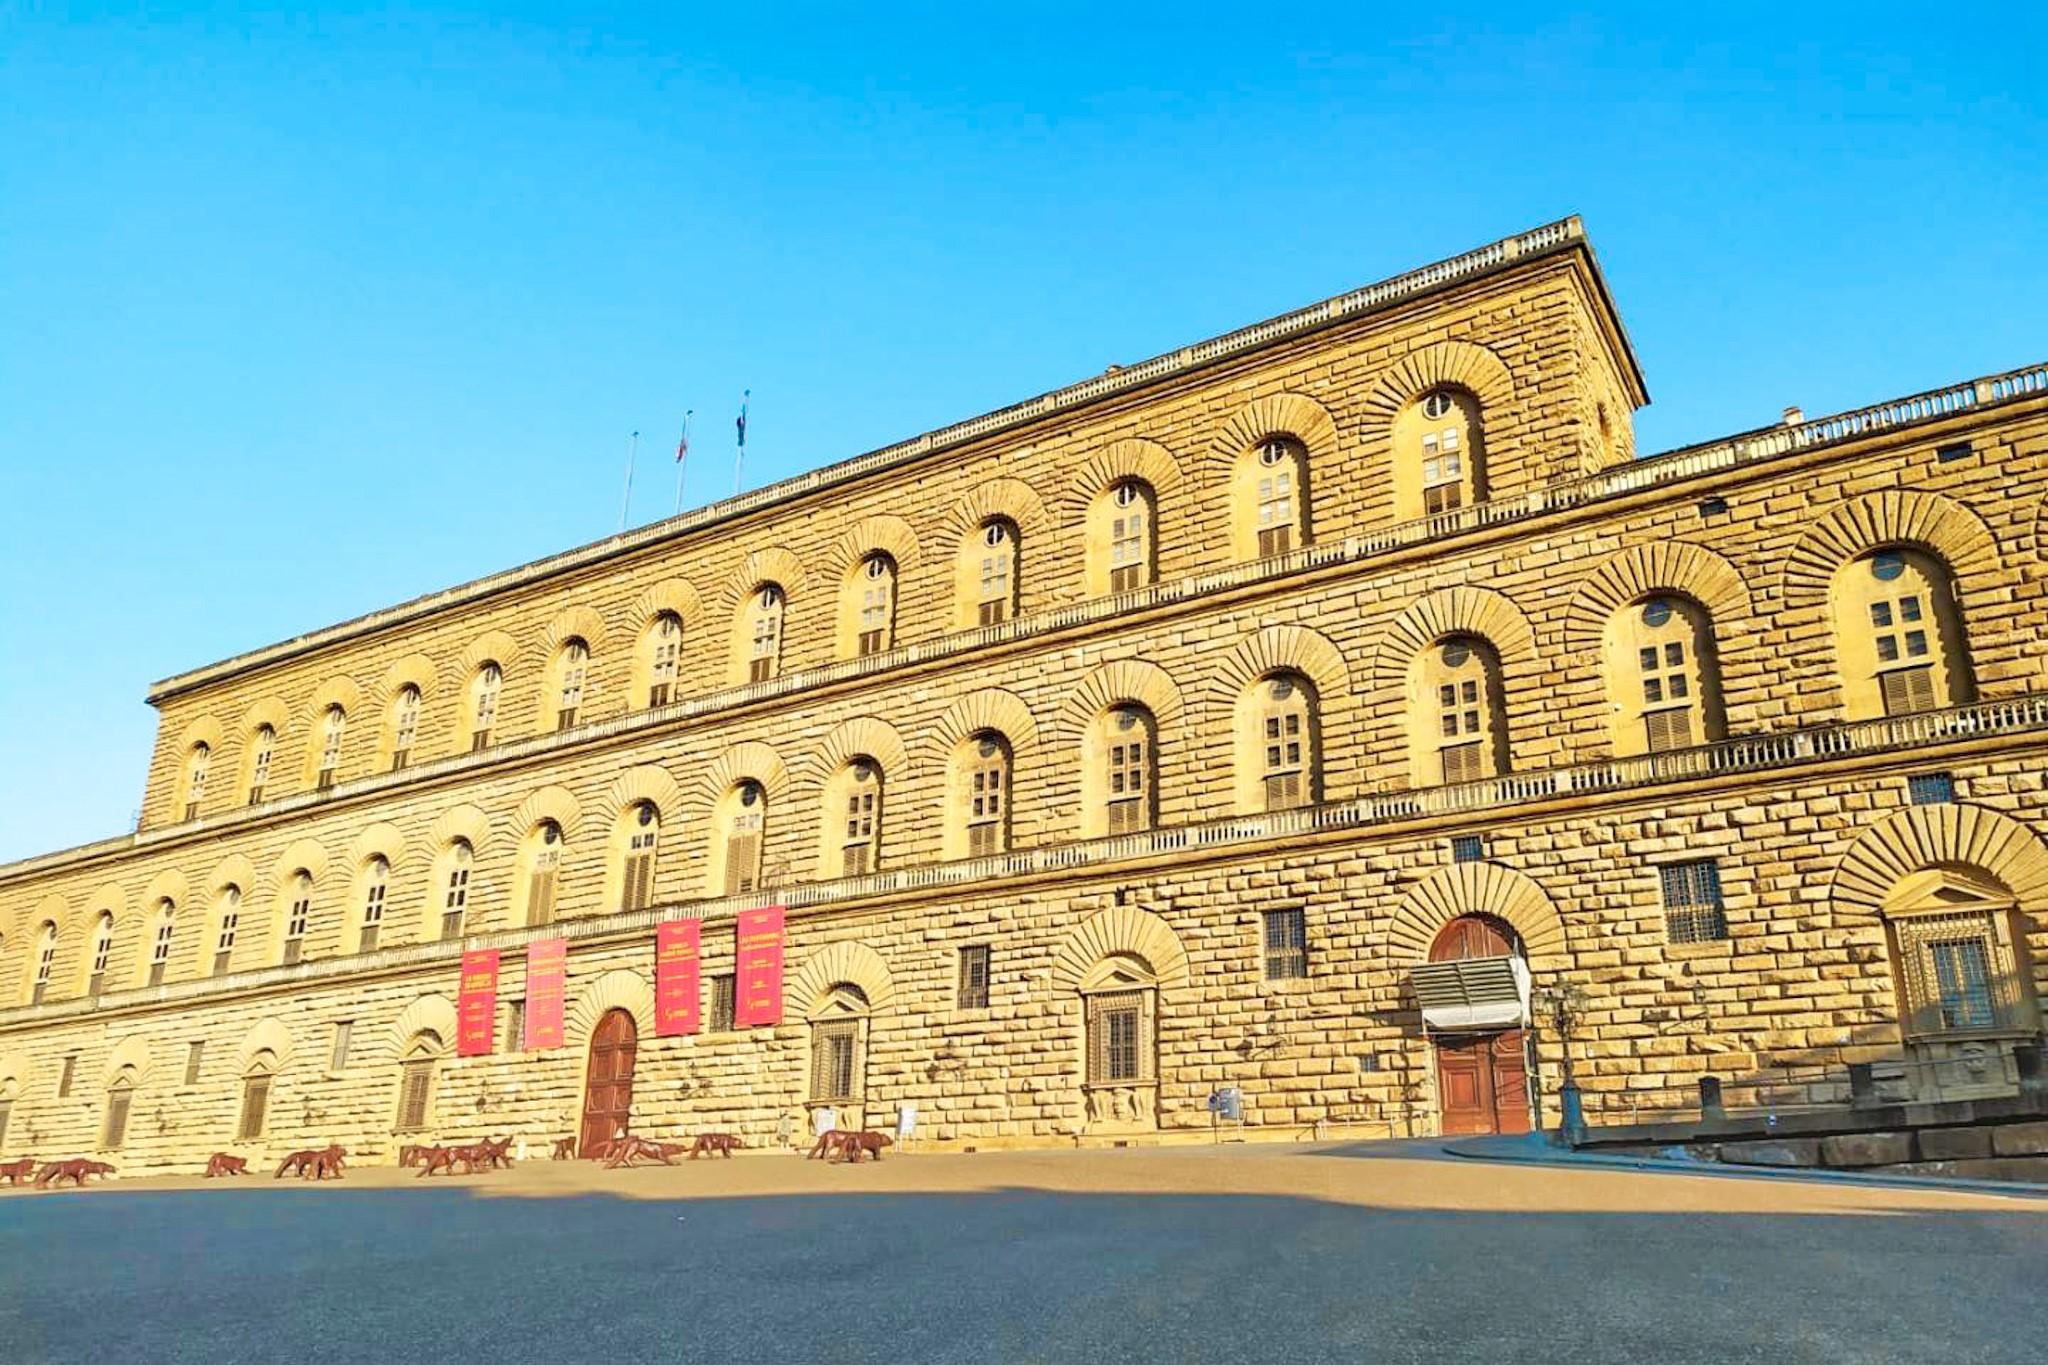 Fachada de entrada al Palacio Pitti